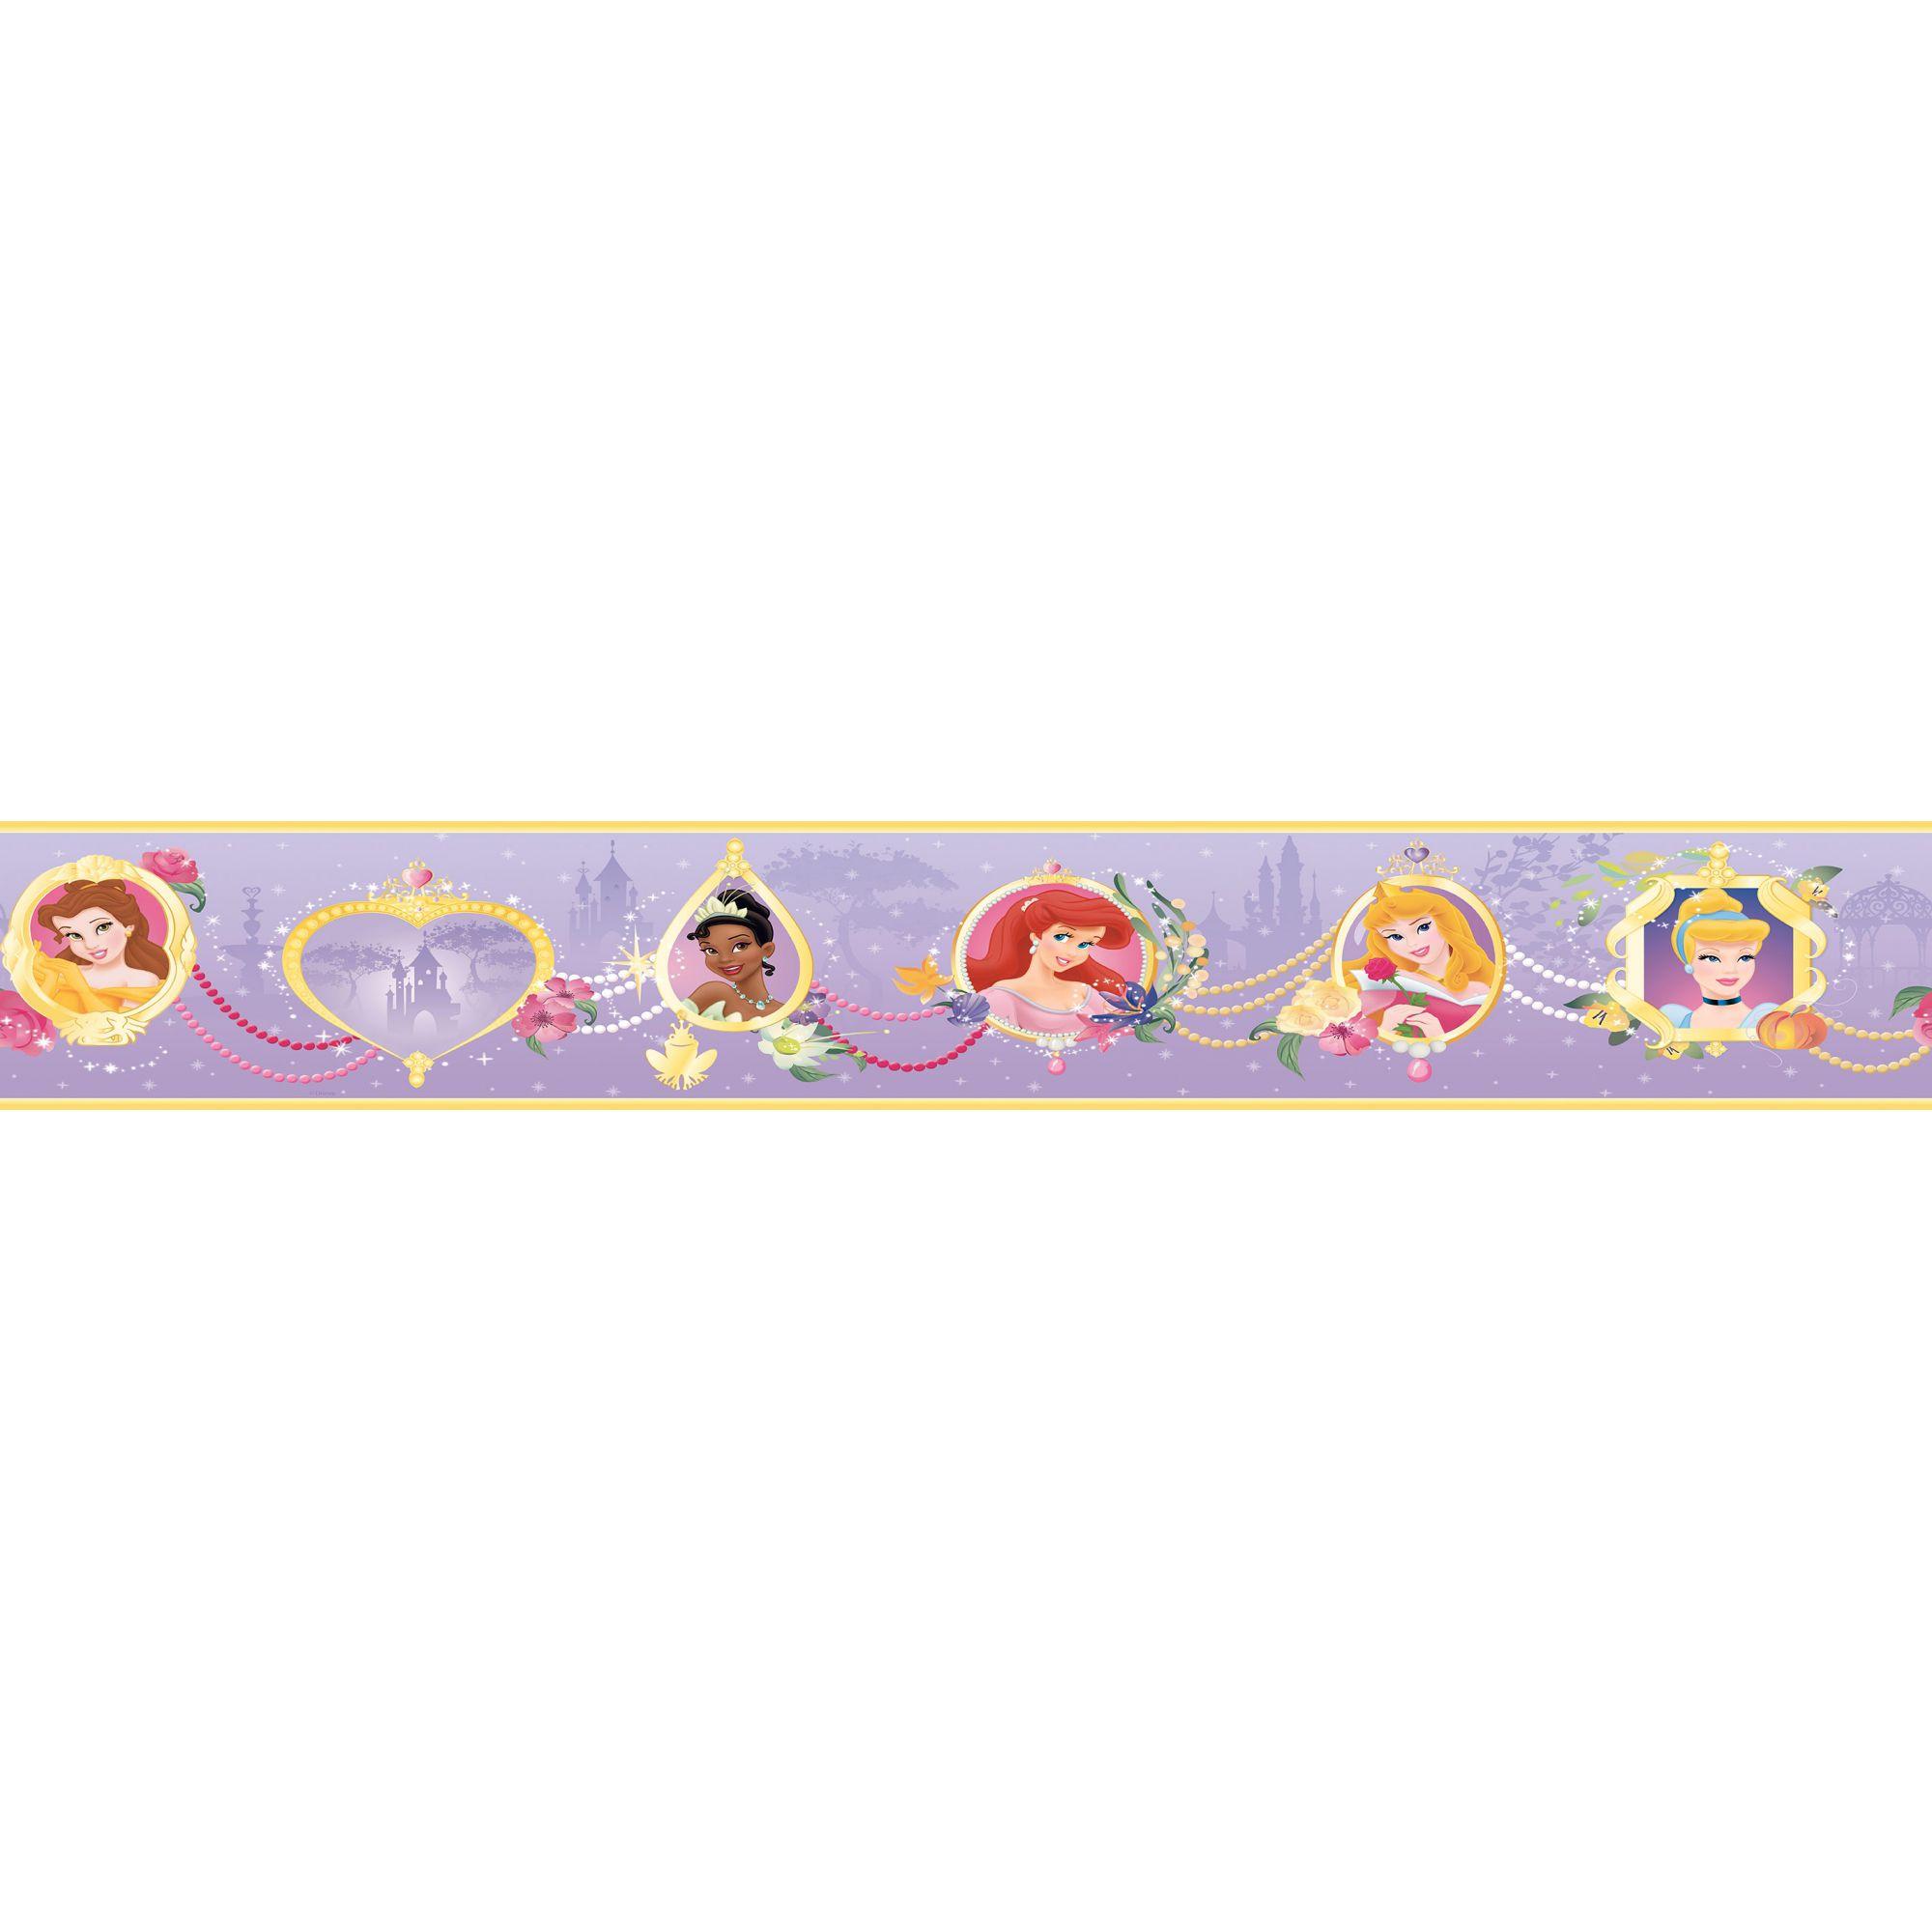 Faixa Decorativa Adesiva Princesas 2  - Final Decor